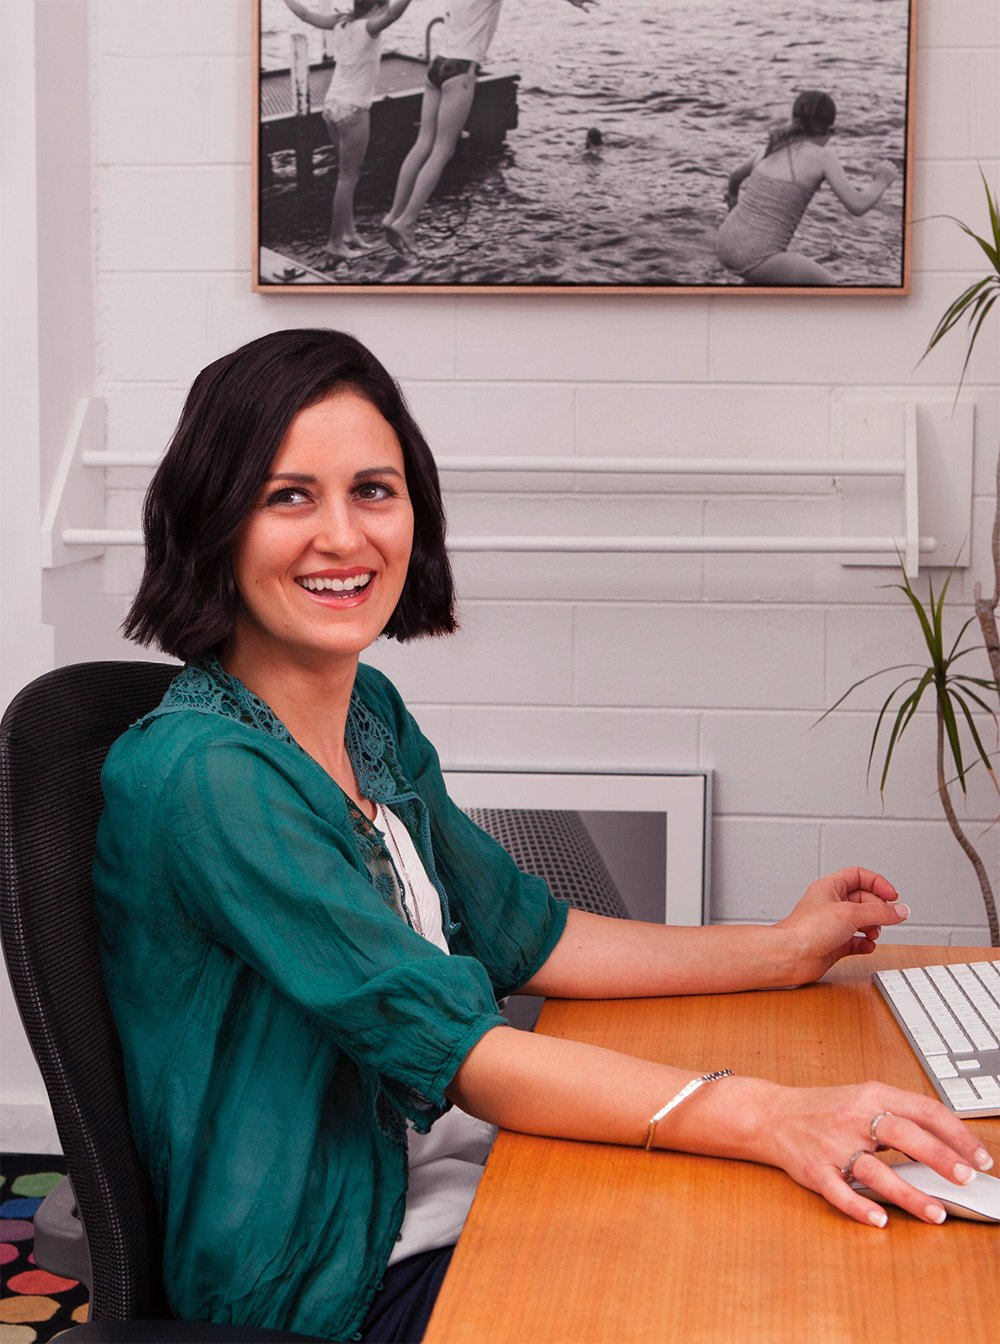 Raelle Kelly - Owner & Creative Director